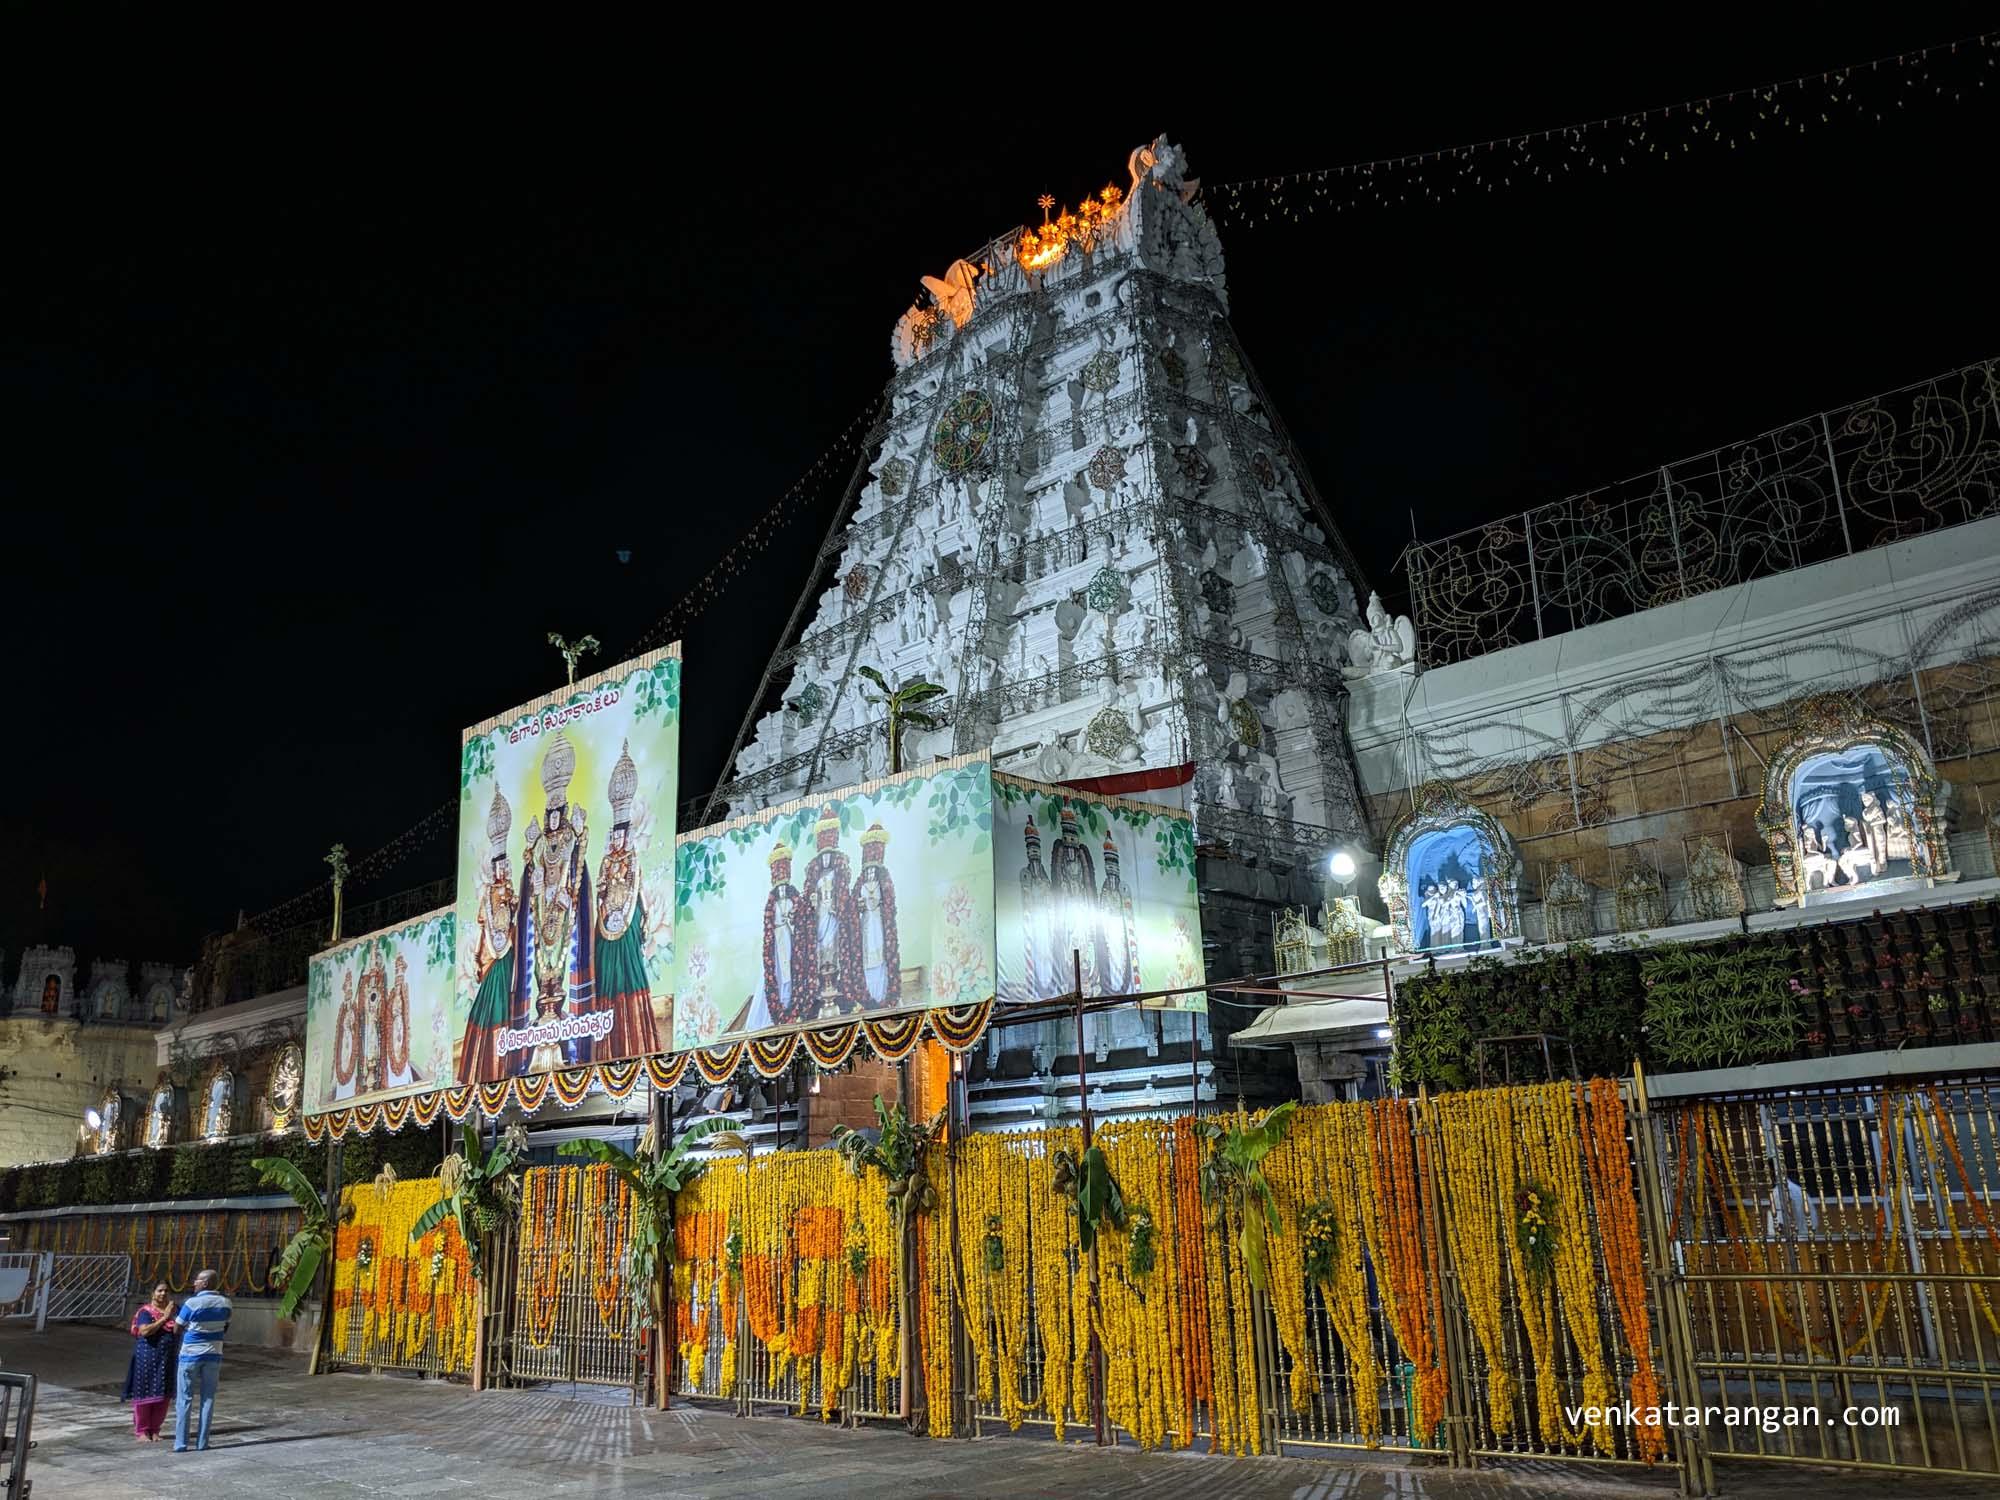 Tirumala Tirupati temple -திருமலை திருப்பதி வெங்கடாசலபதி கோயில்